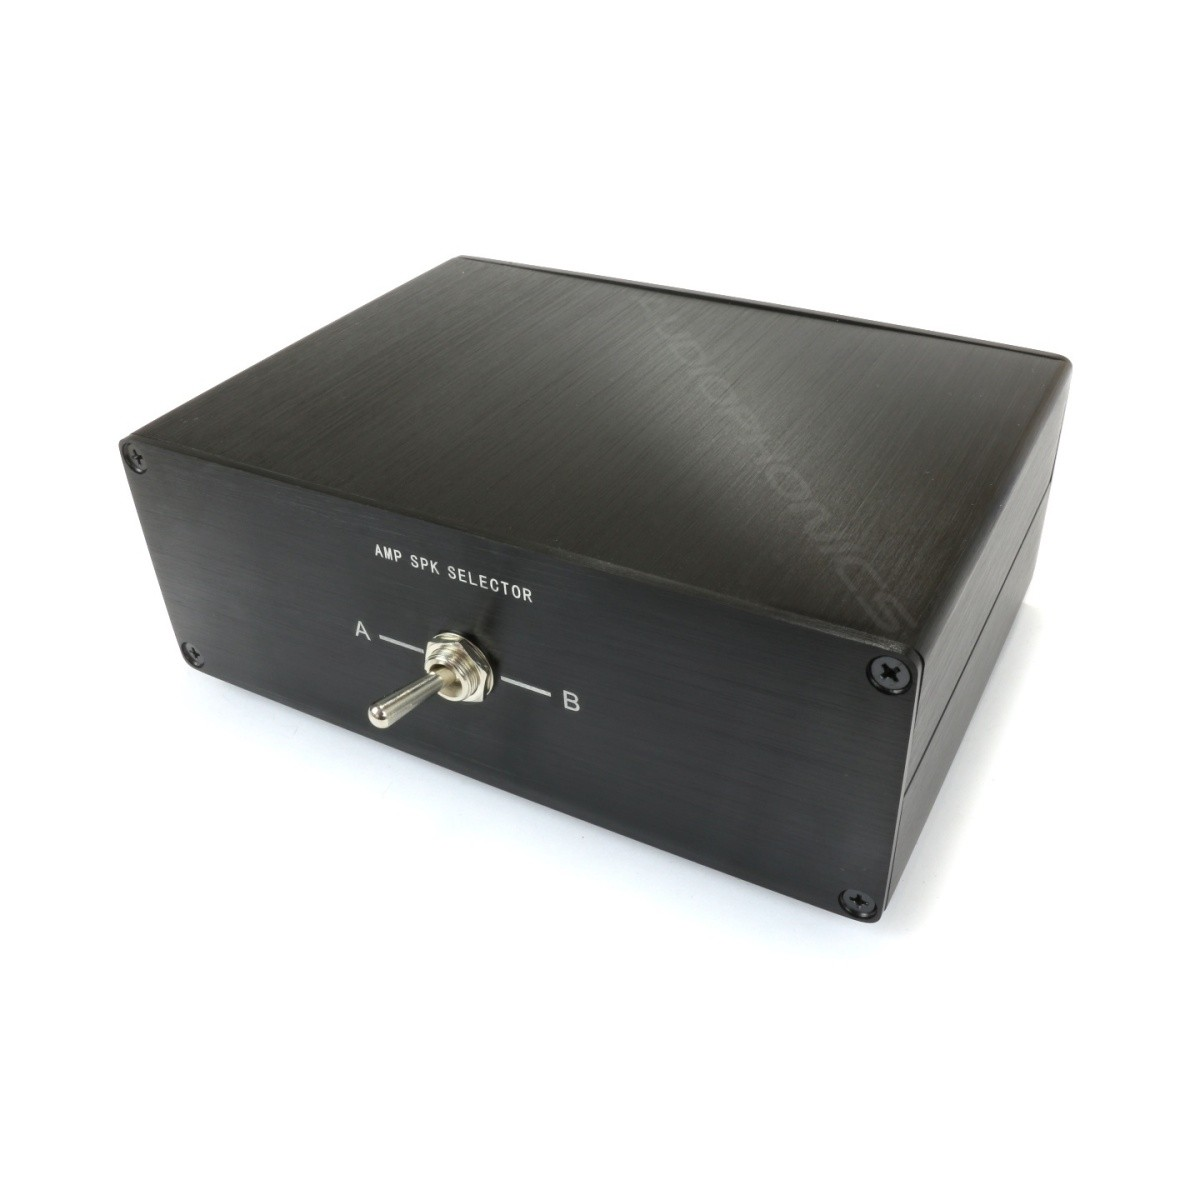 Selecteur audio 1 to 2 reversible for speaker / amplifier Black